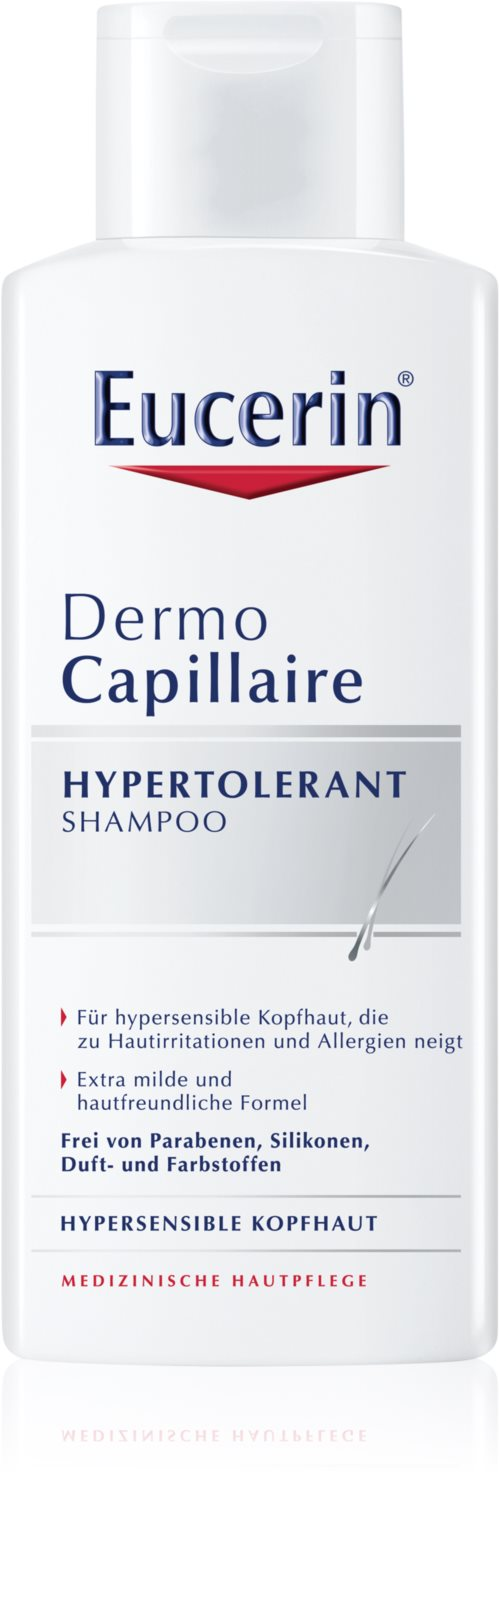 eucerin-dermocapillaire-hypertolerantni-sampon-pro-podrazdenou-pokozku___25